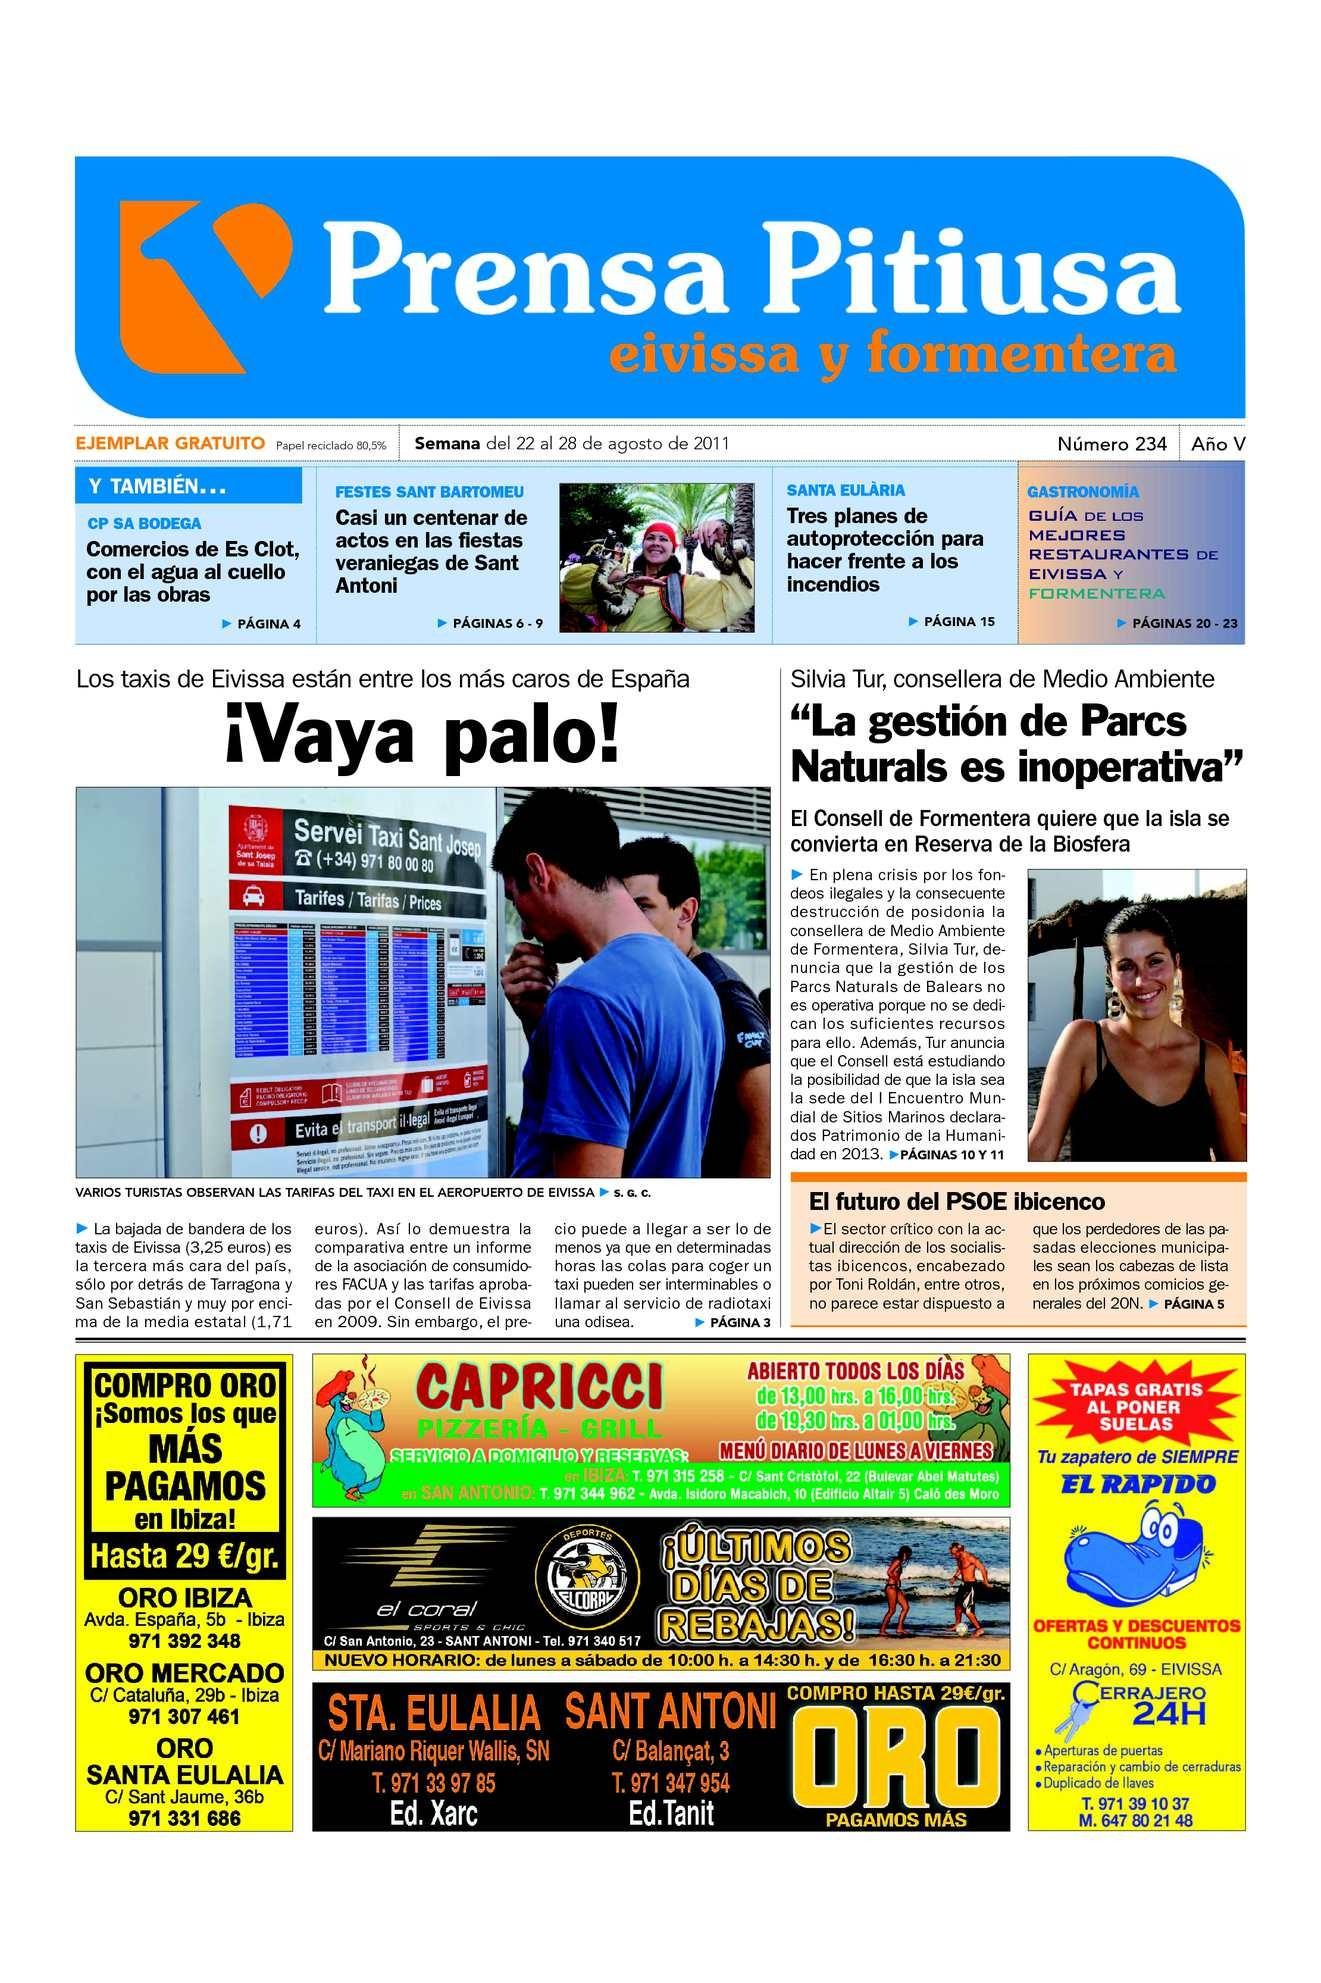 Imprimir Calendario Hotmail Recientes Calaméo Prensa Pitiusa Edici³n 234